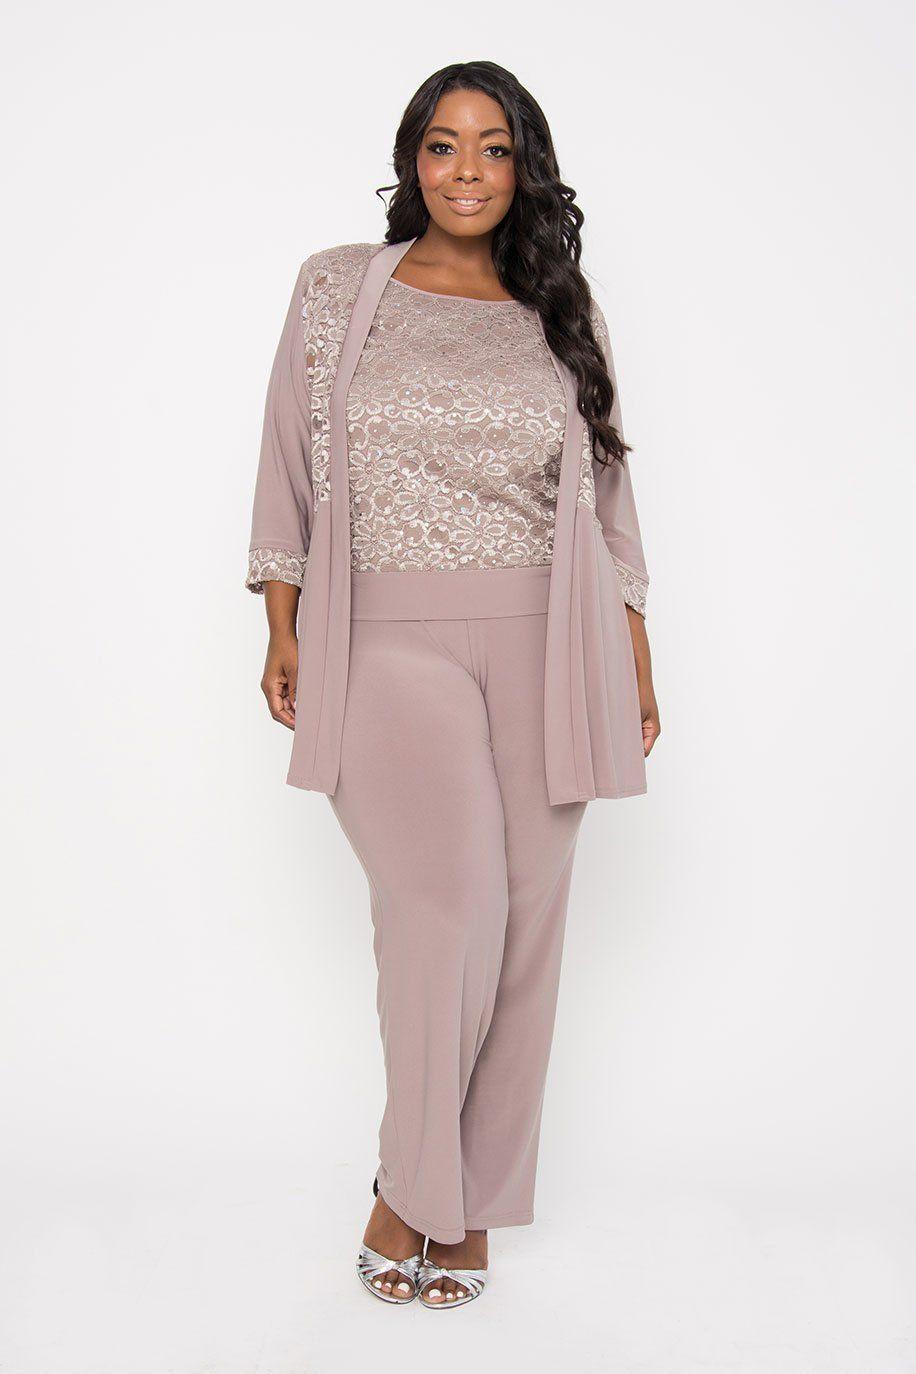 ddd30b14b9e R M Richards Mother of the Bride Formal Plus Size Pant Suit ...